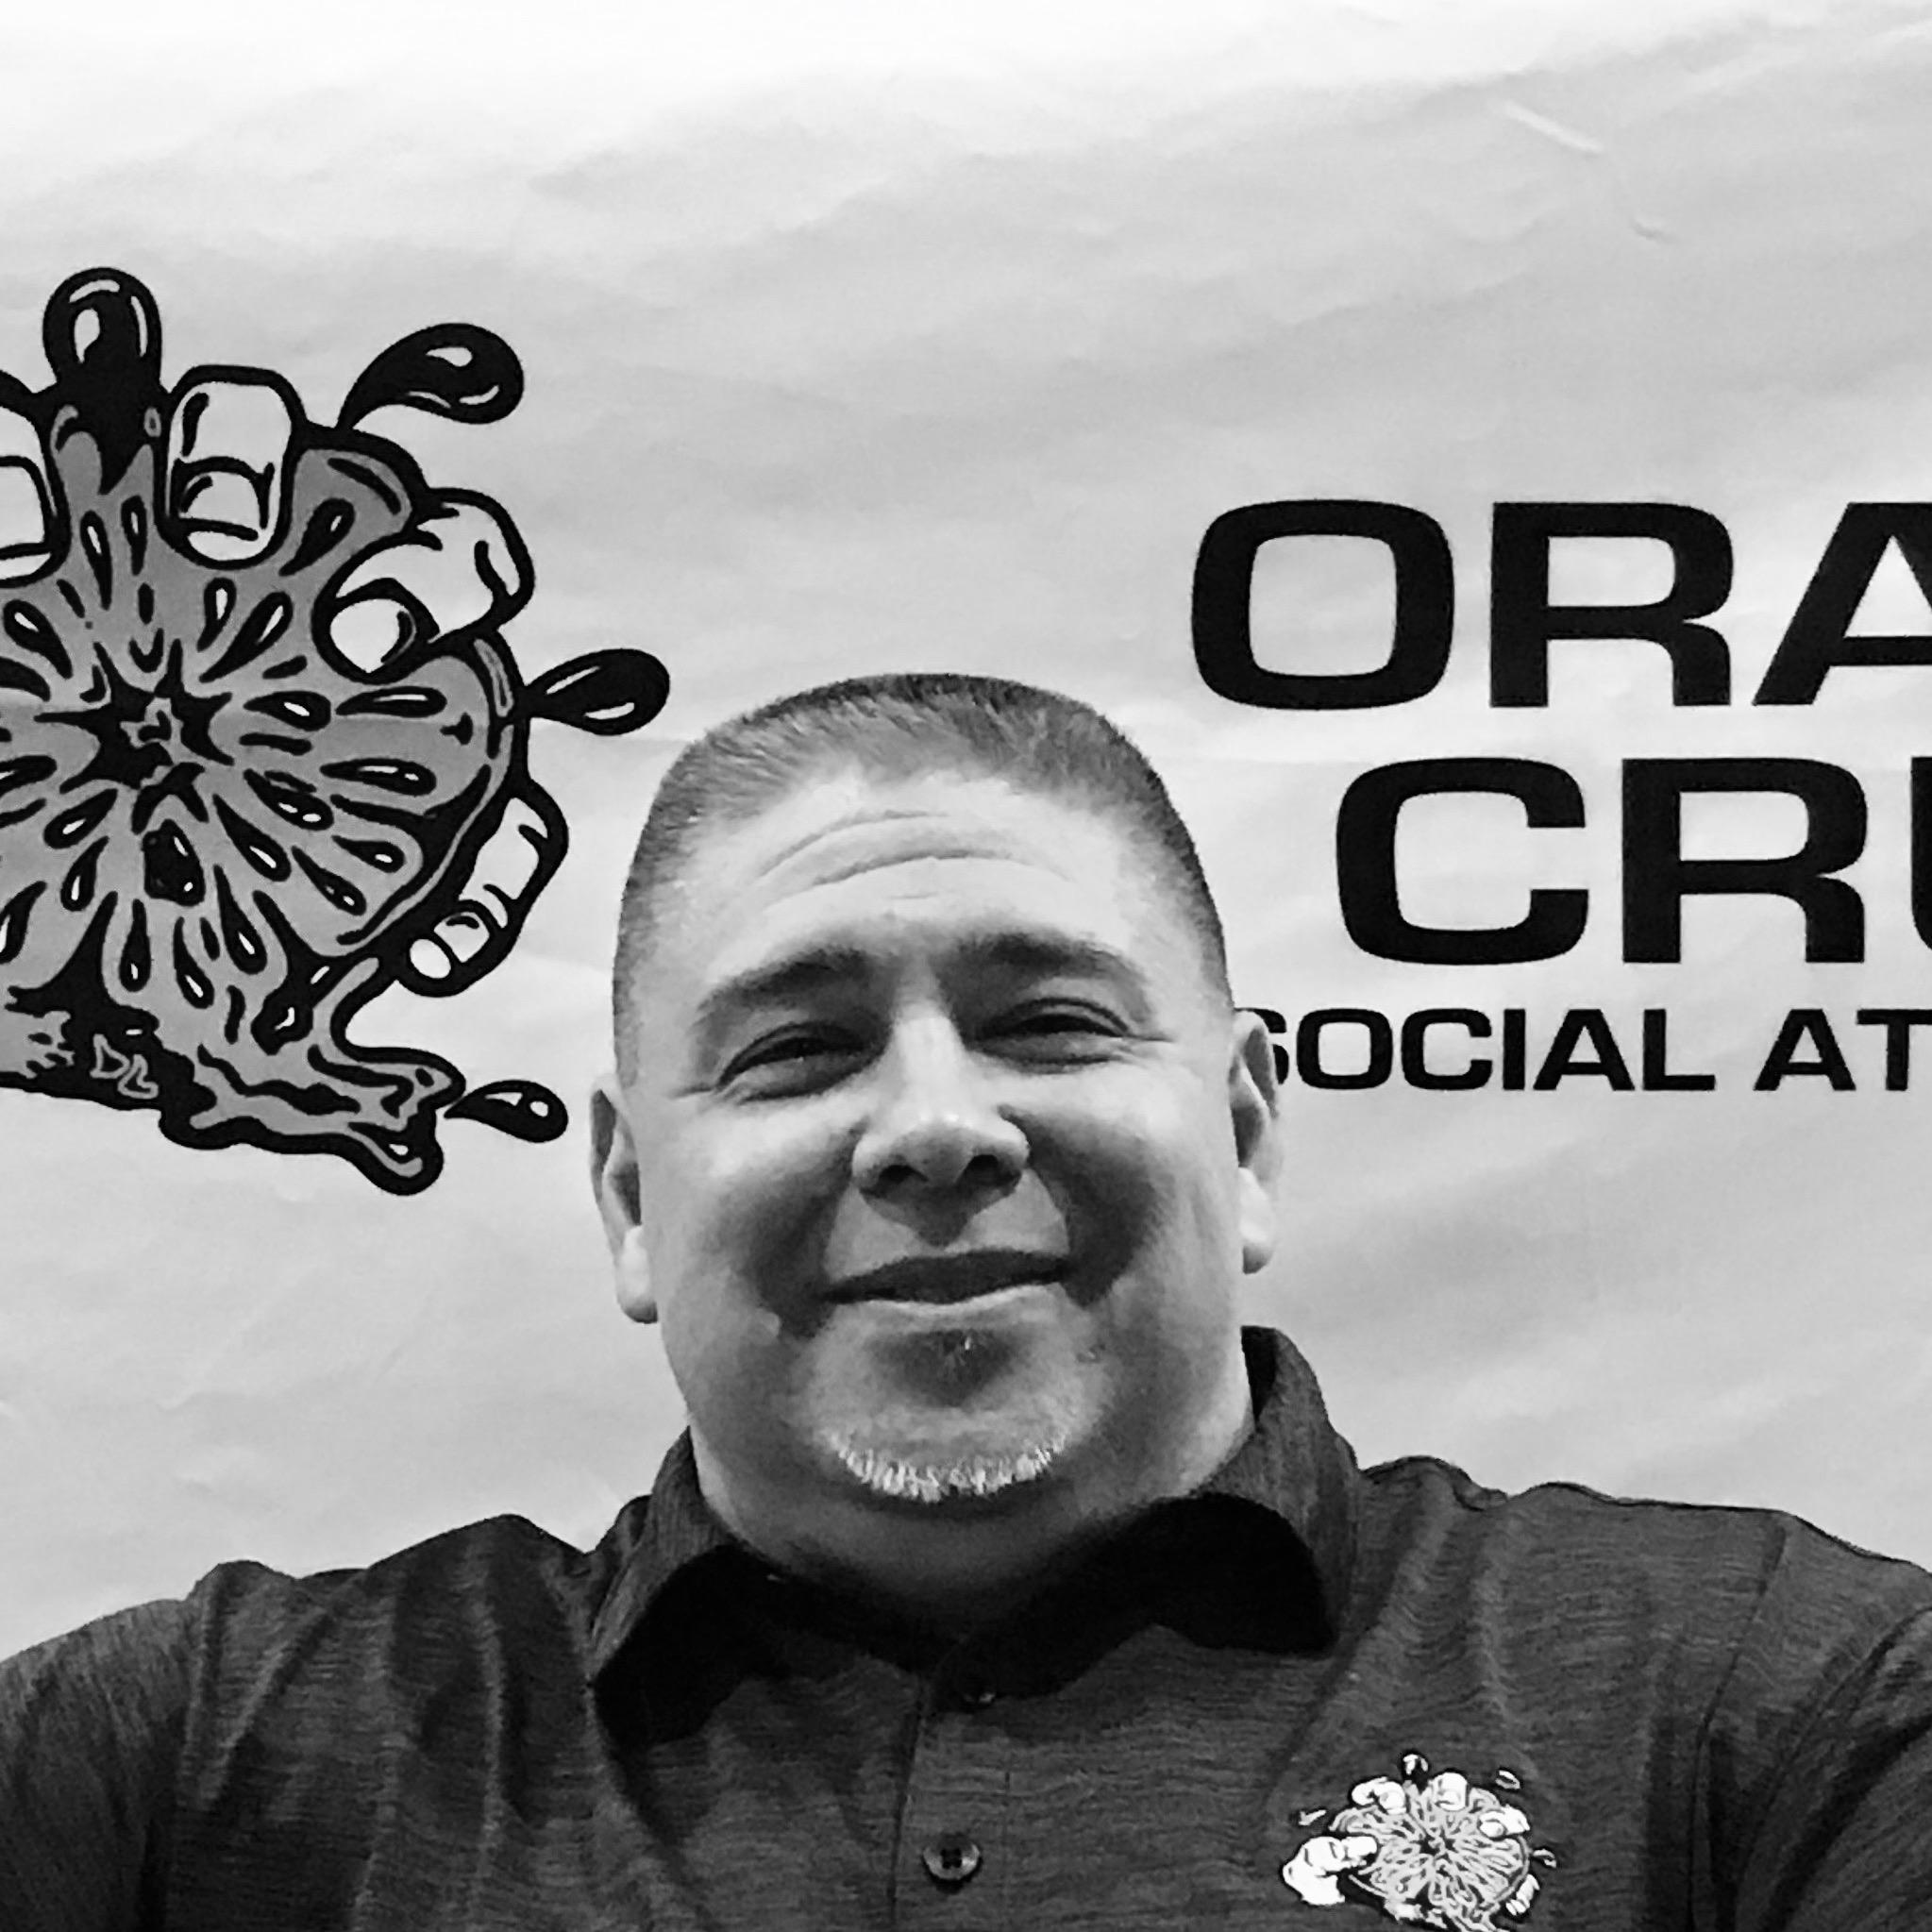 John Cano - VICE PRESIDENT - cano@orangecrushsac.com